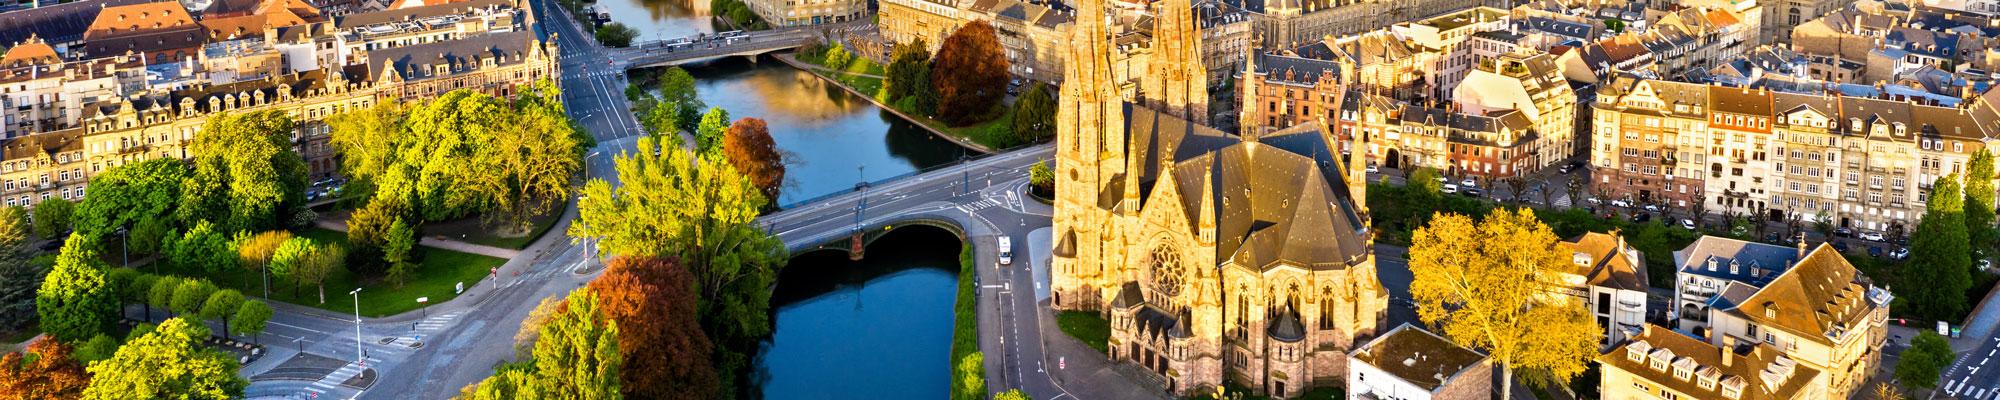 Mastère à Strasbourg / Diplôme Bac+5 en alternance